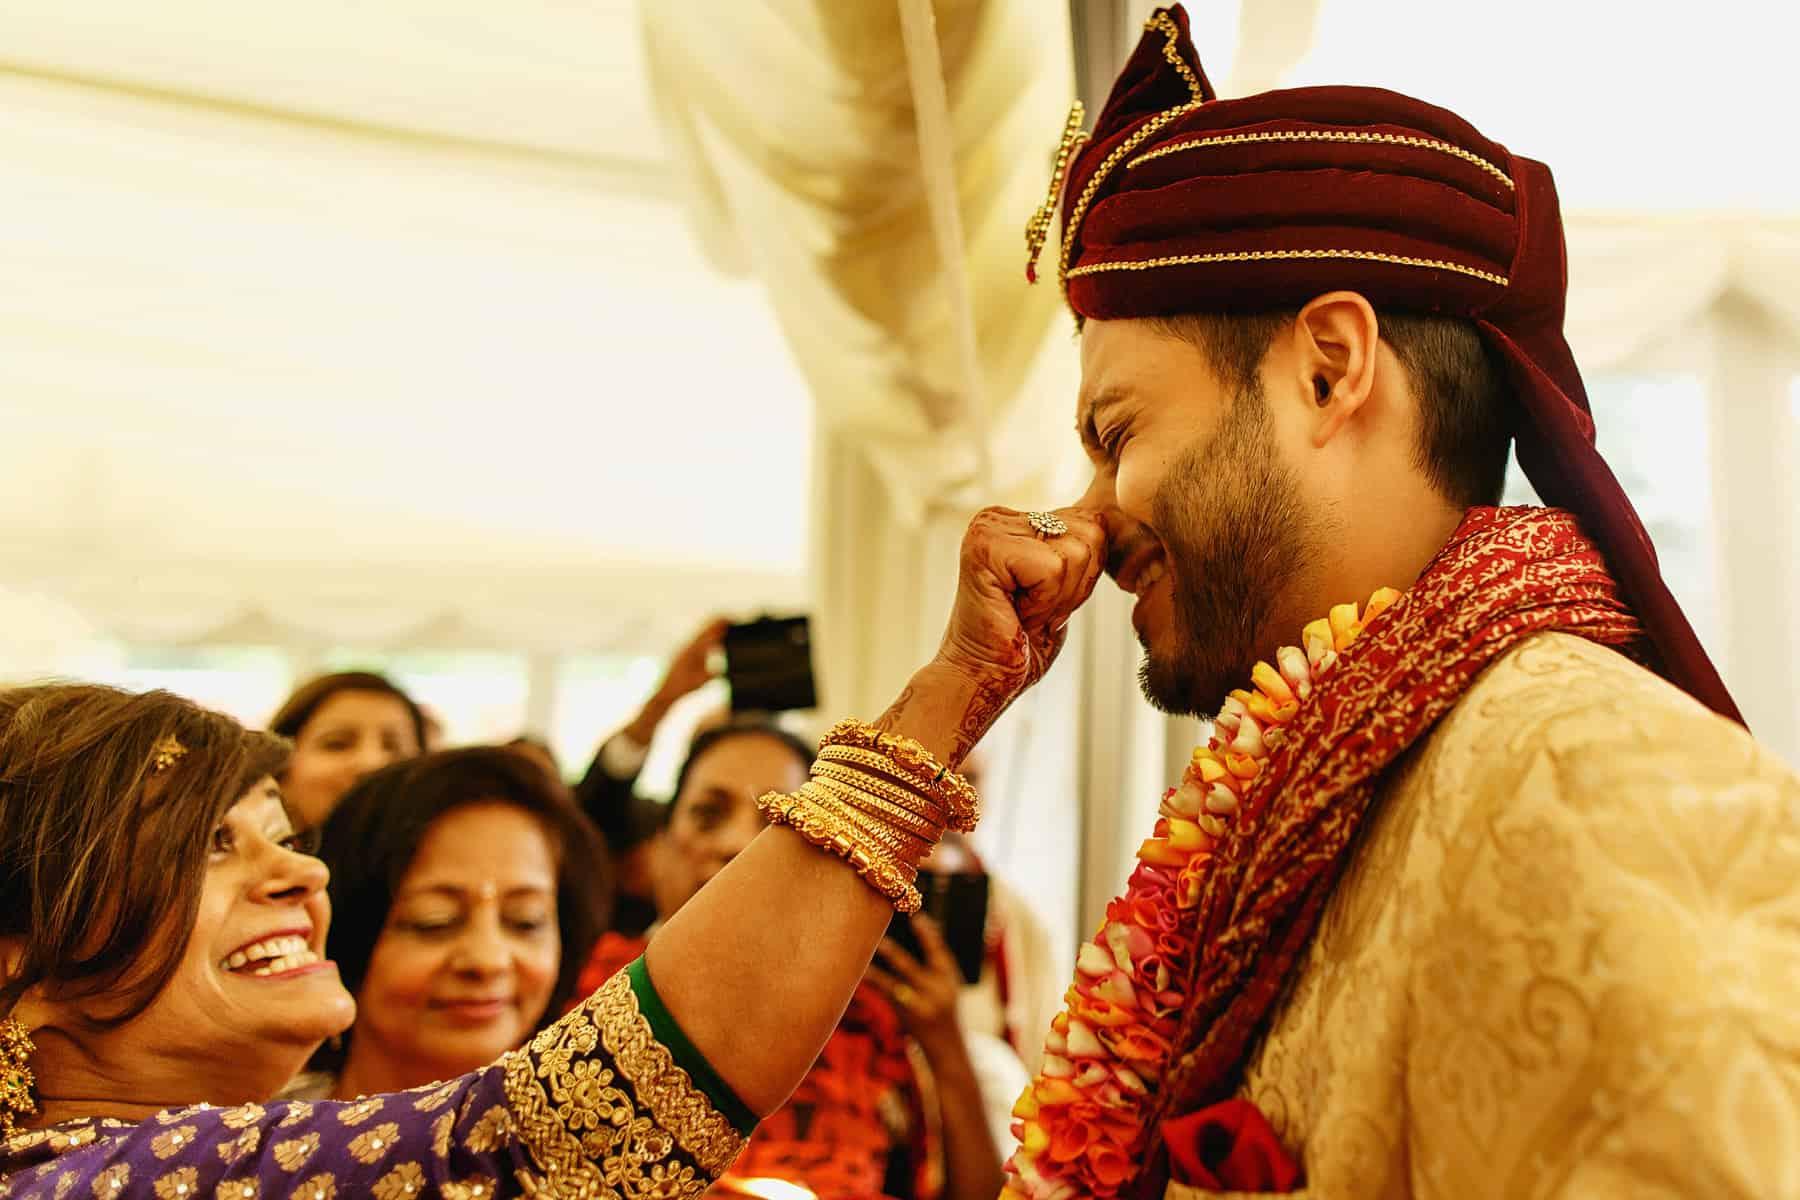 thornton manor hindu wedding 1